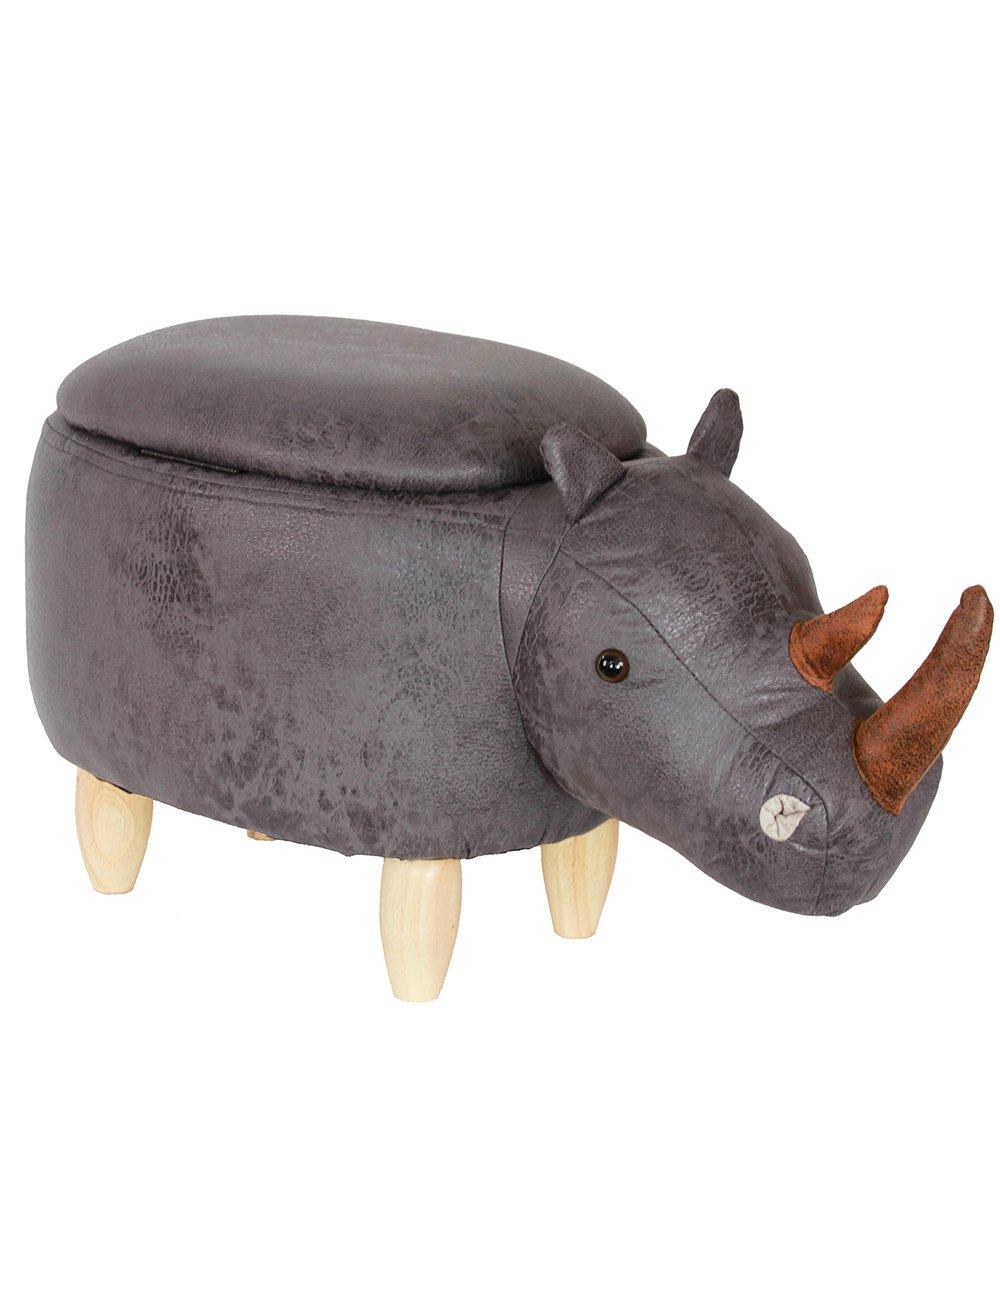 HAOSOON Animal ottoman Series Storage Ottoman Footrest Stool with Vivid Adorable Animal-Like Features(Rhinoceros) (grey) by HAOSOON (Image #2)